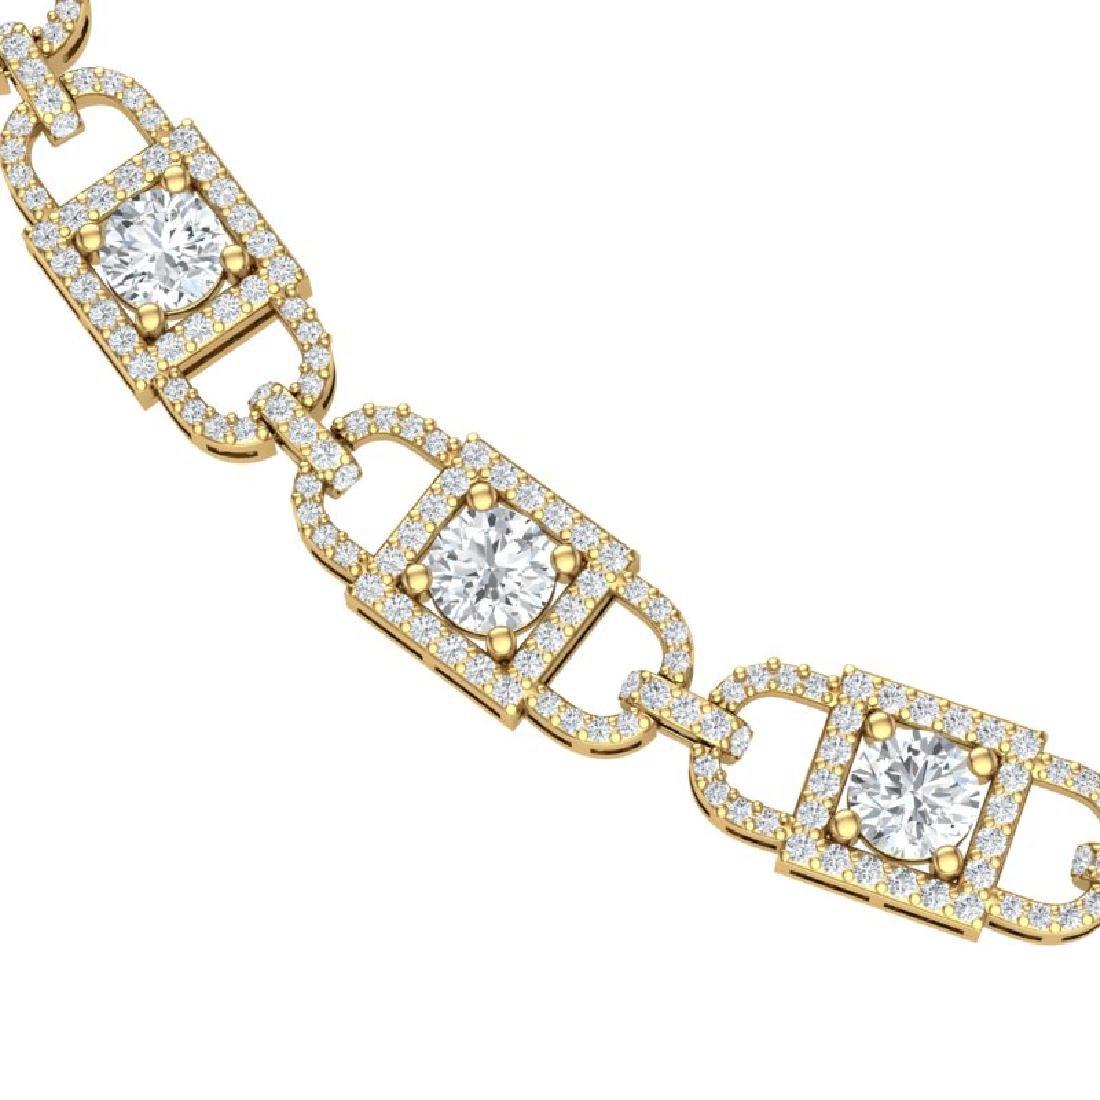 20 CTW Certified SI/I Diamond Halo Necklace 18K Yellow - 2